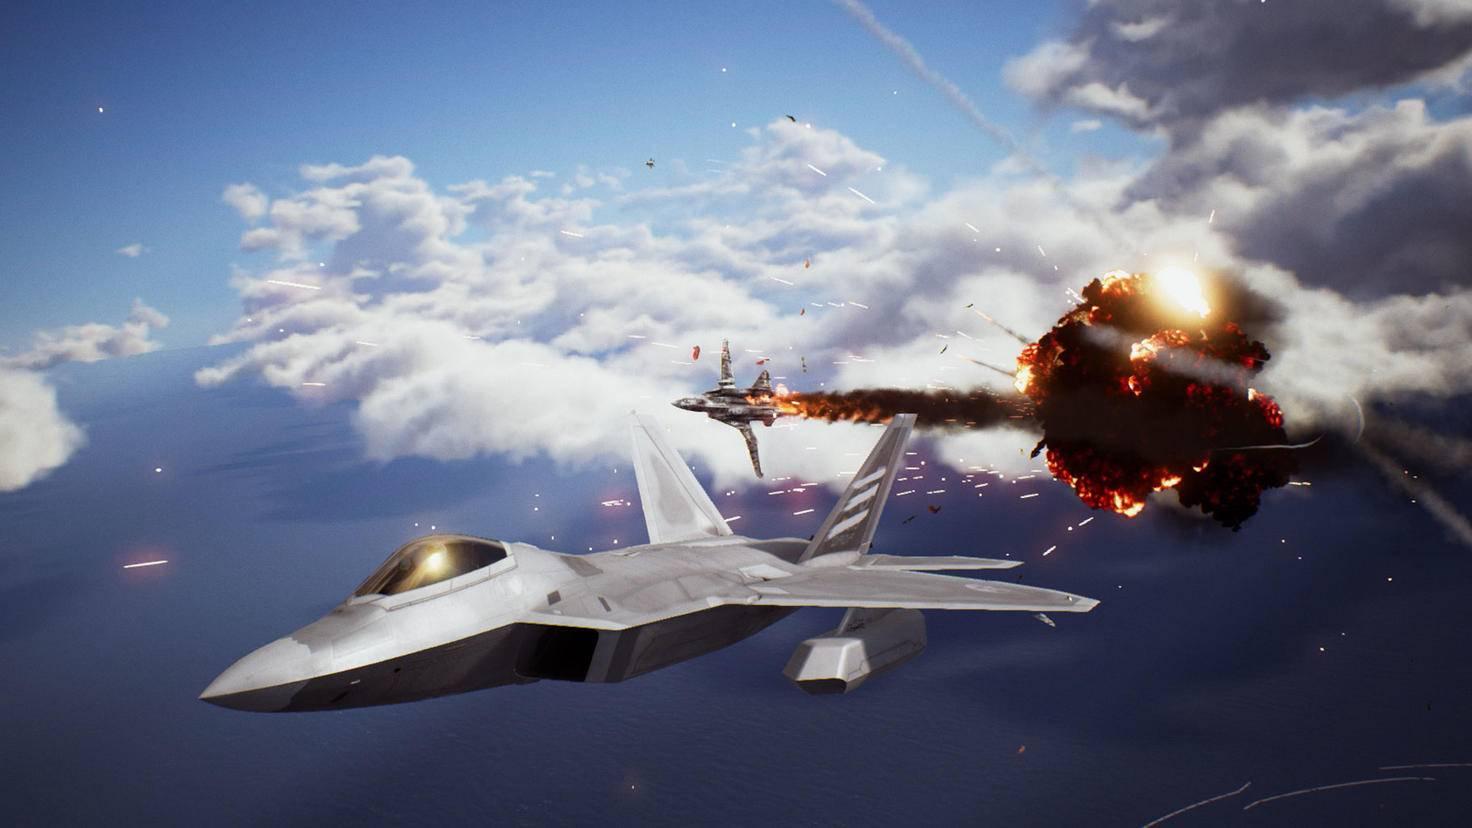 ace-combat-7-screenshot-multiplayer